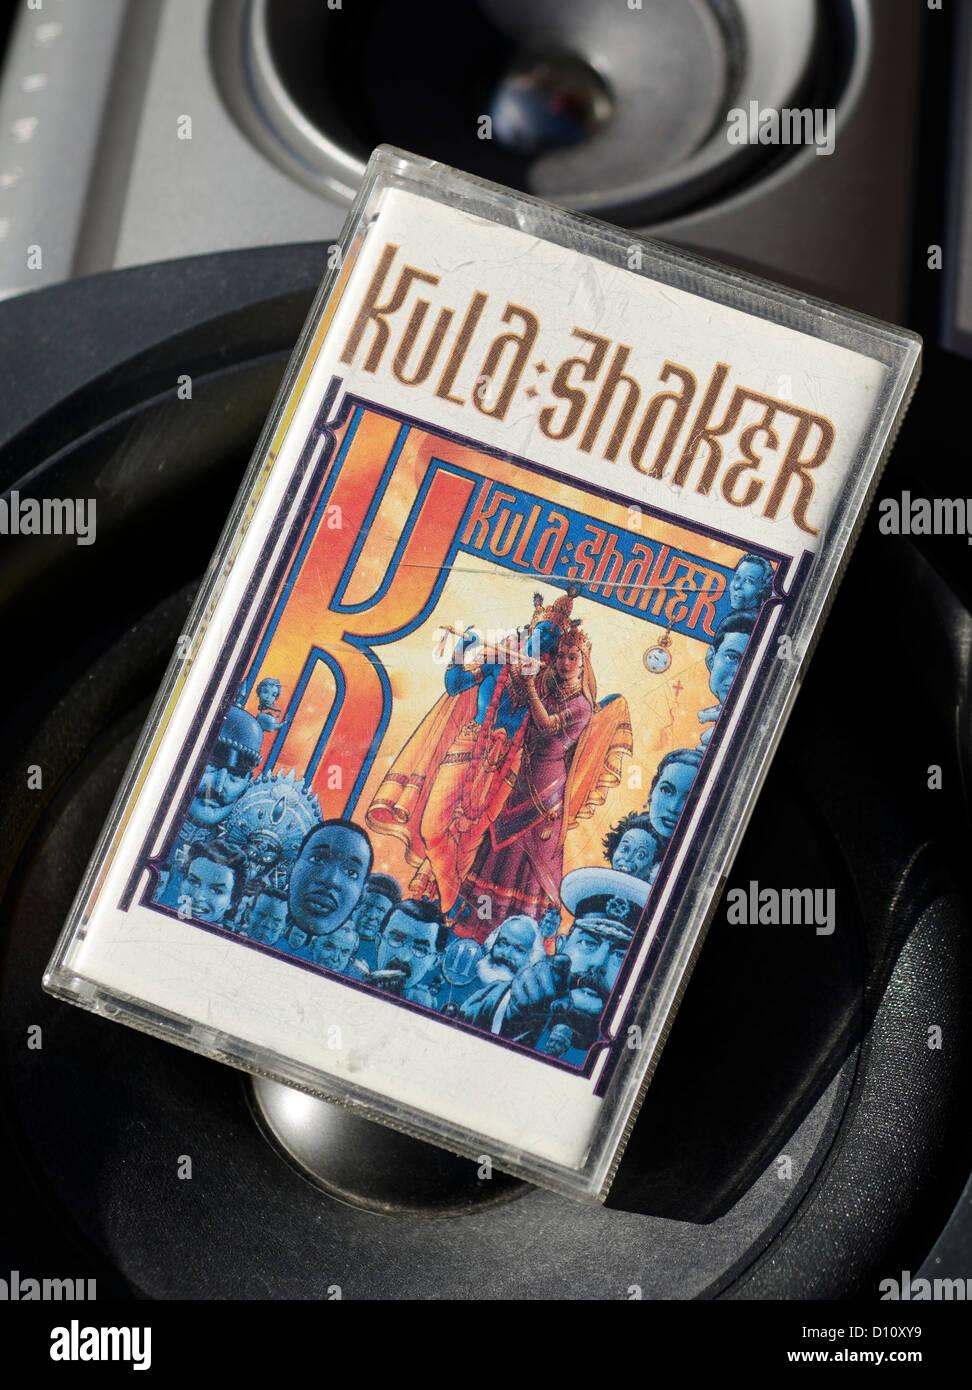 Audio Cassette Tape of Kula Shaker. Stock Photo